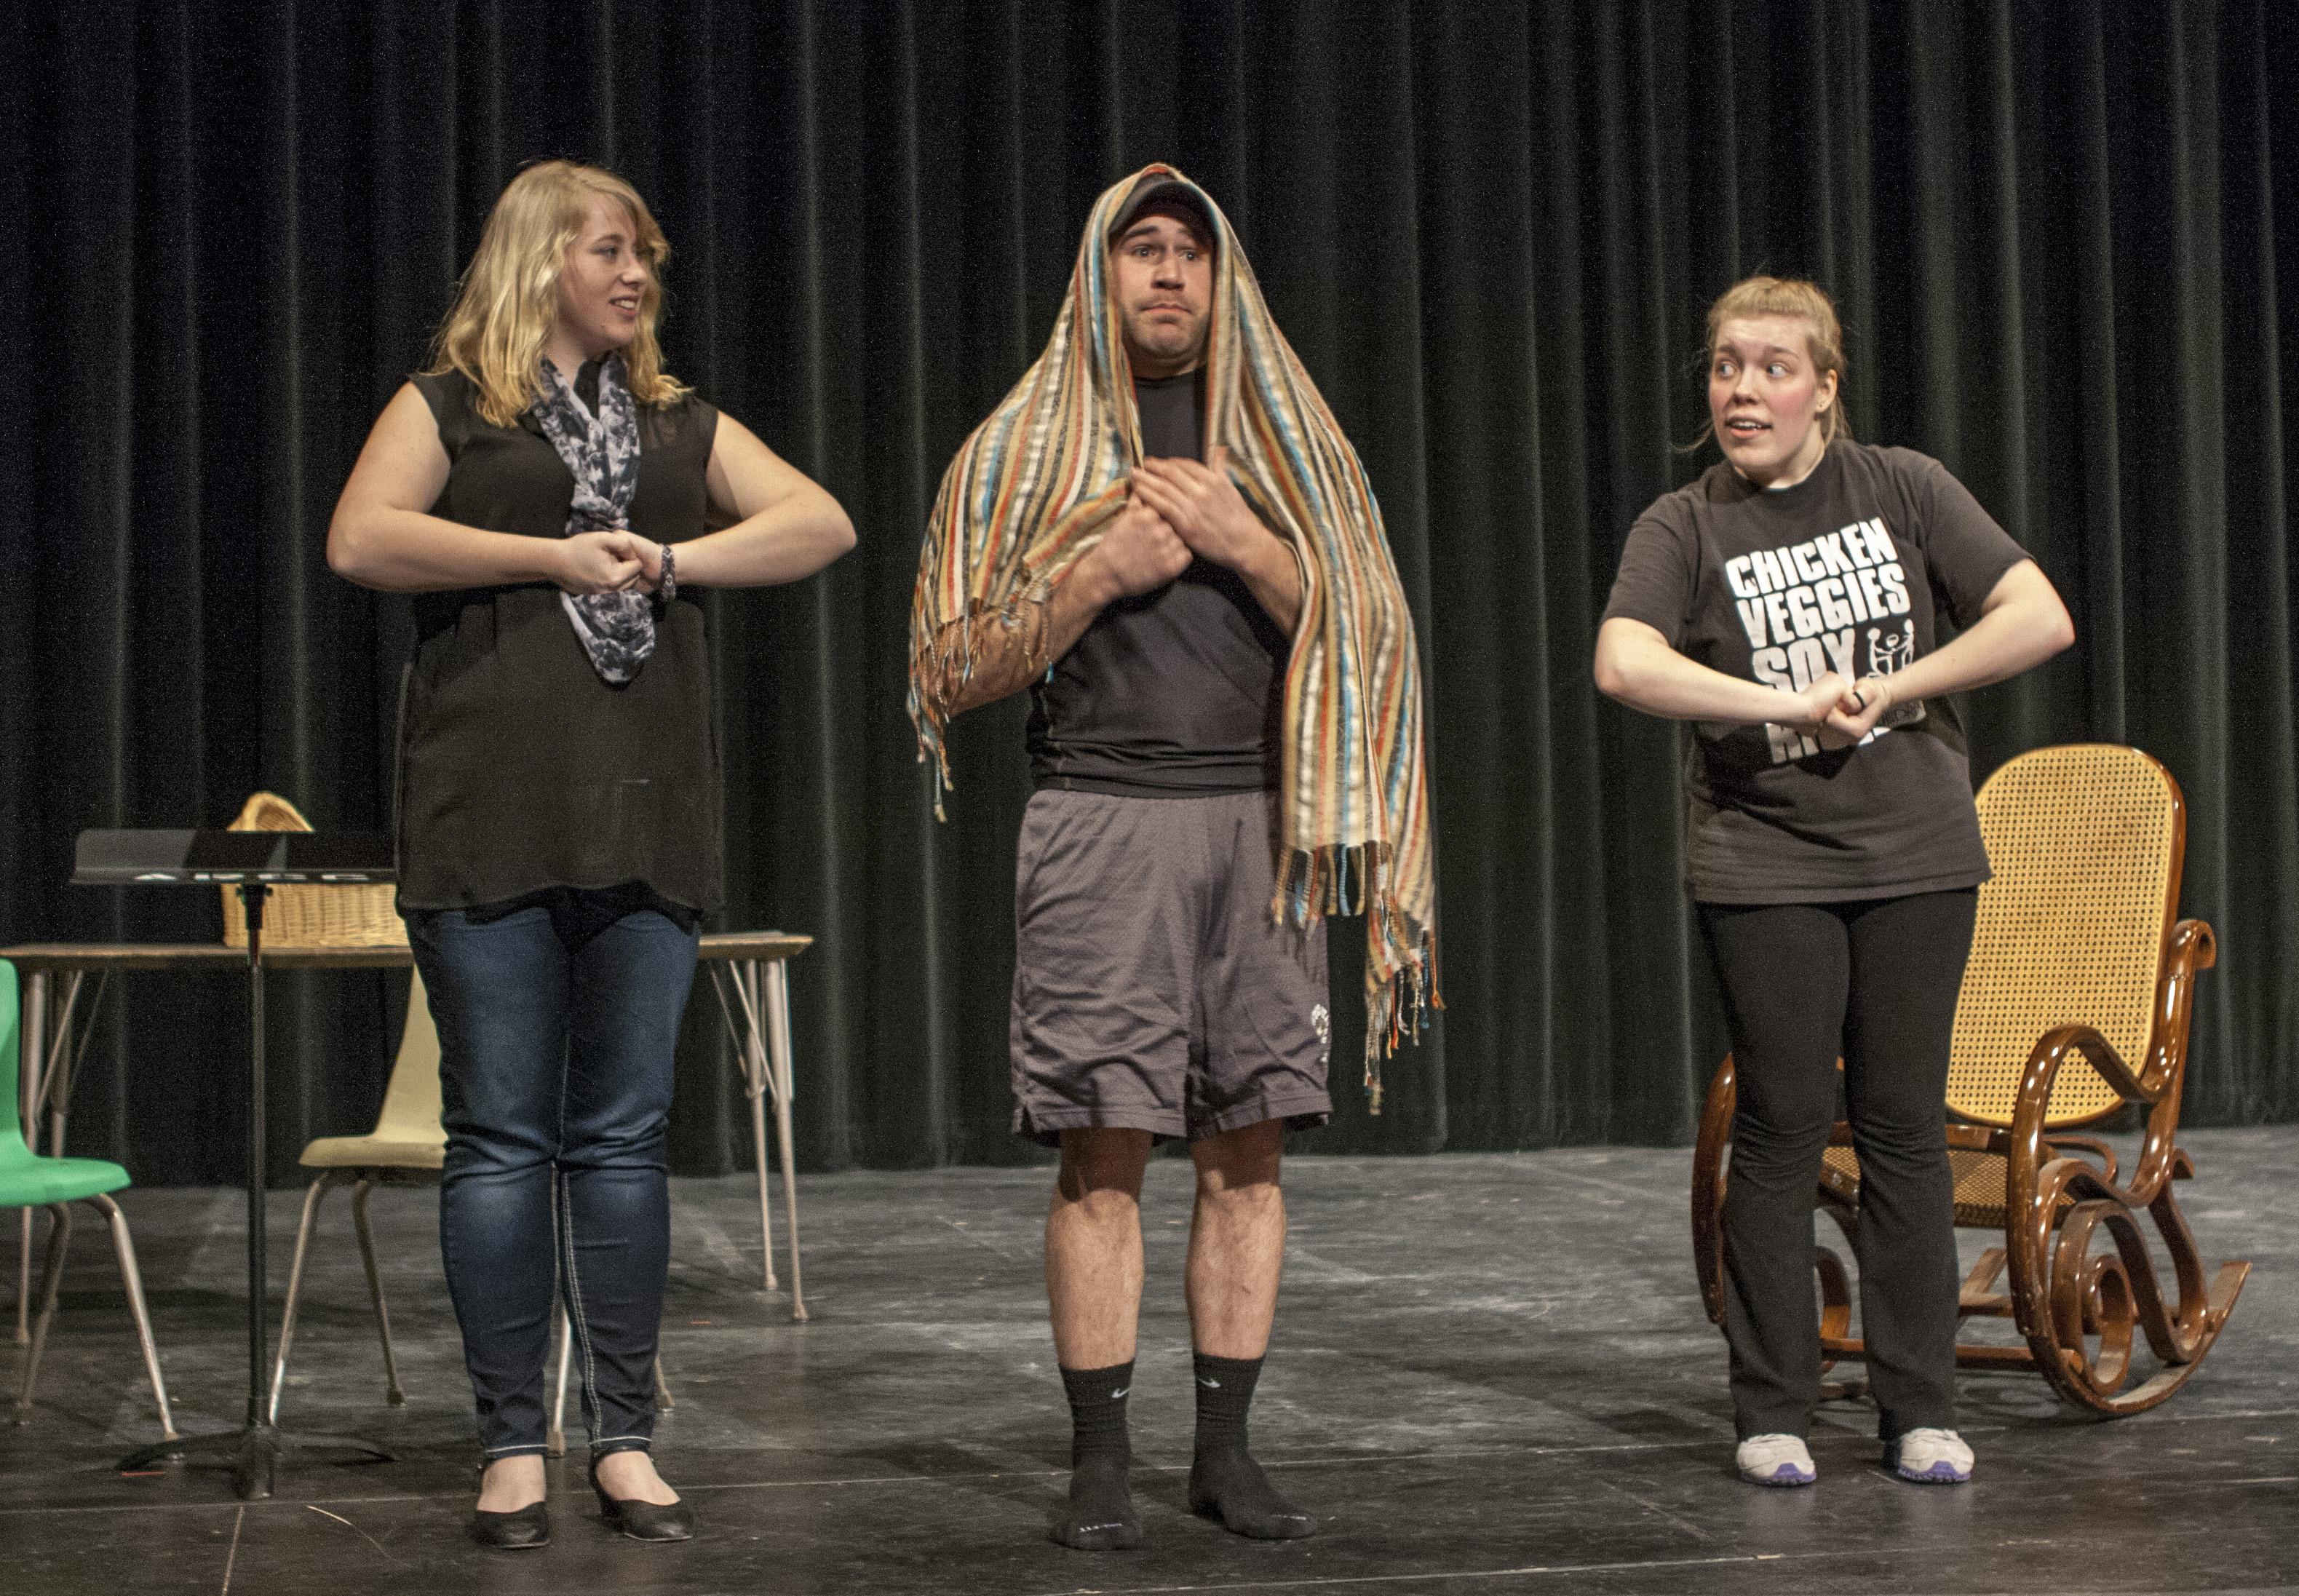 Melanie Bratsch, Jarrod Dukowitz, Emily Picardi rehearsing a scene on March 10. PHOTO BY LAUREN KASTNER